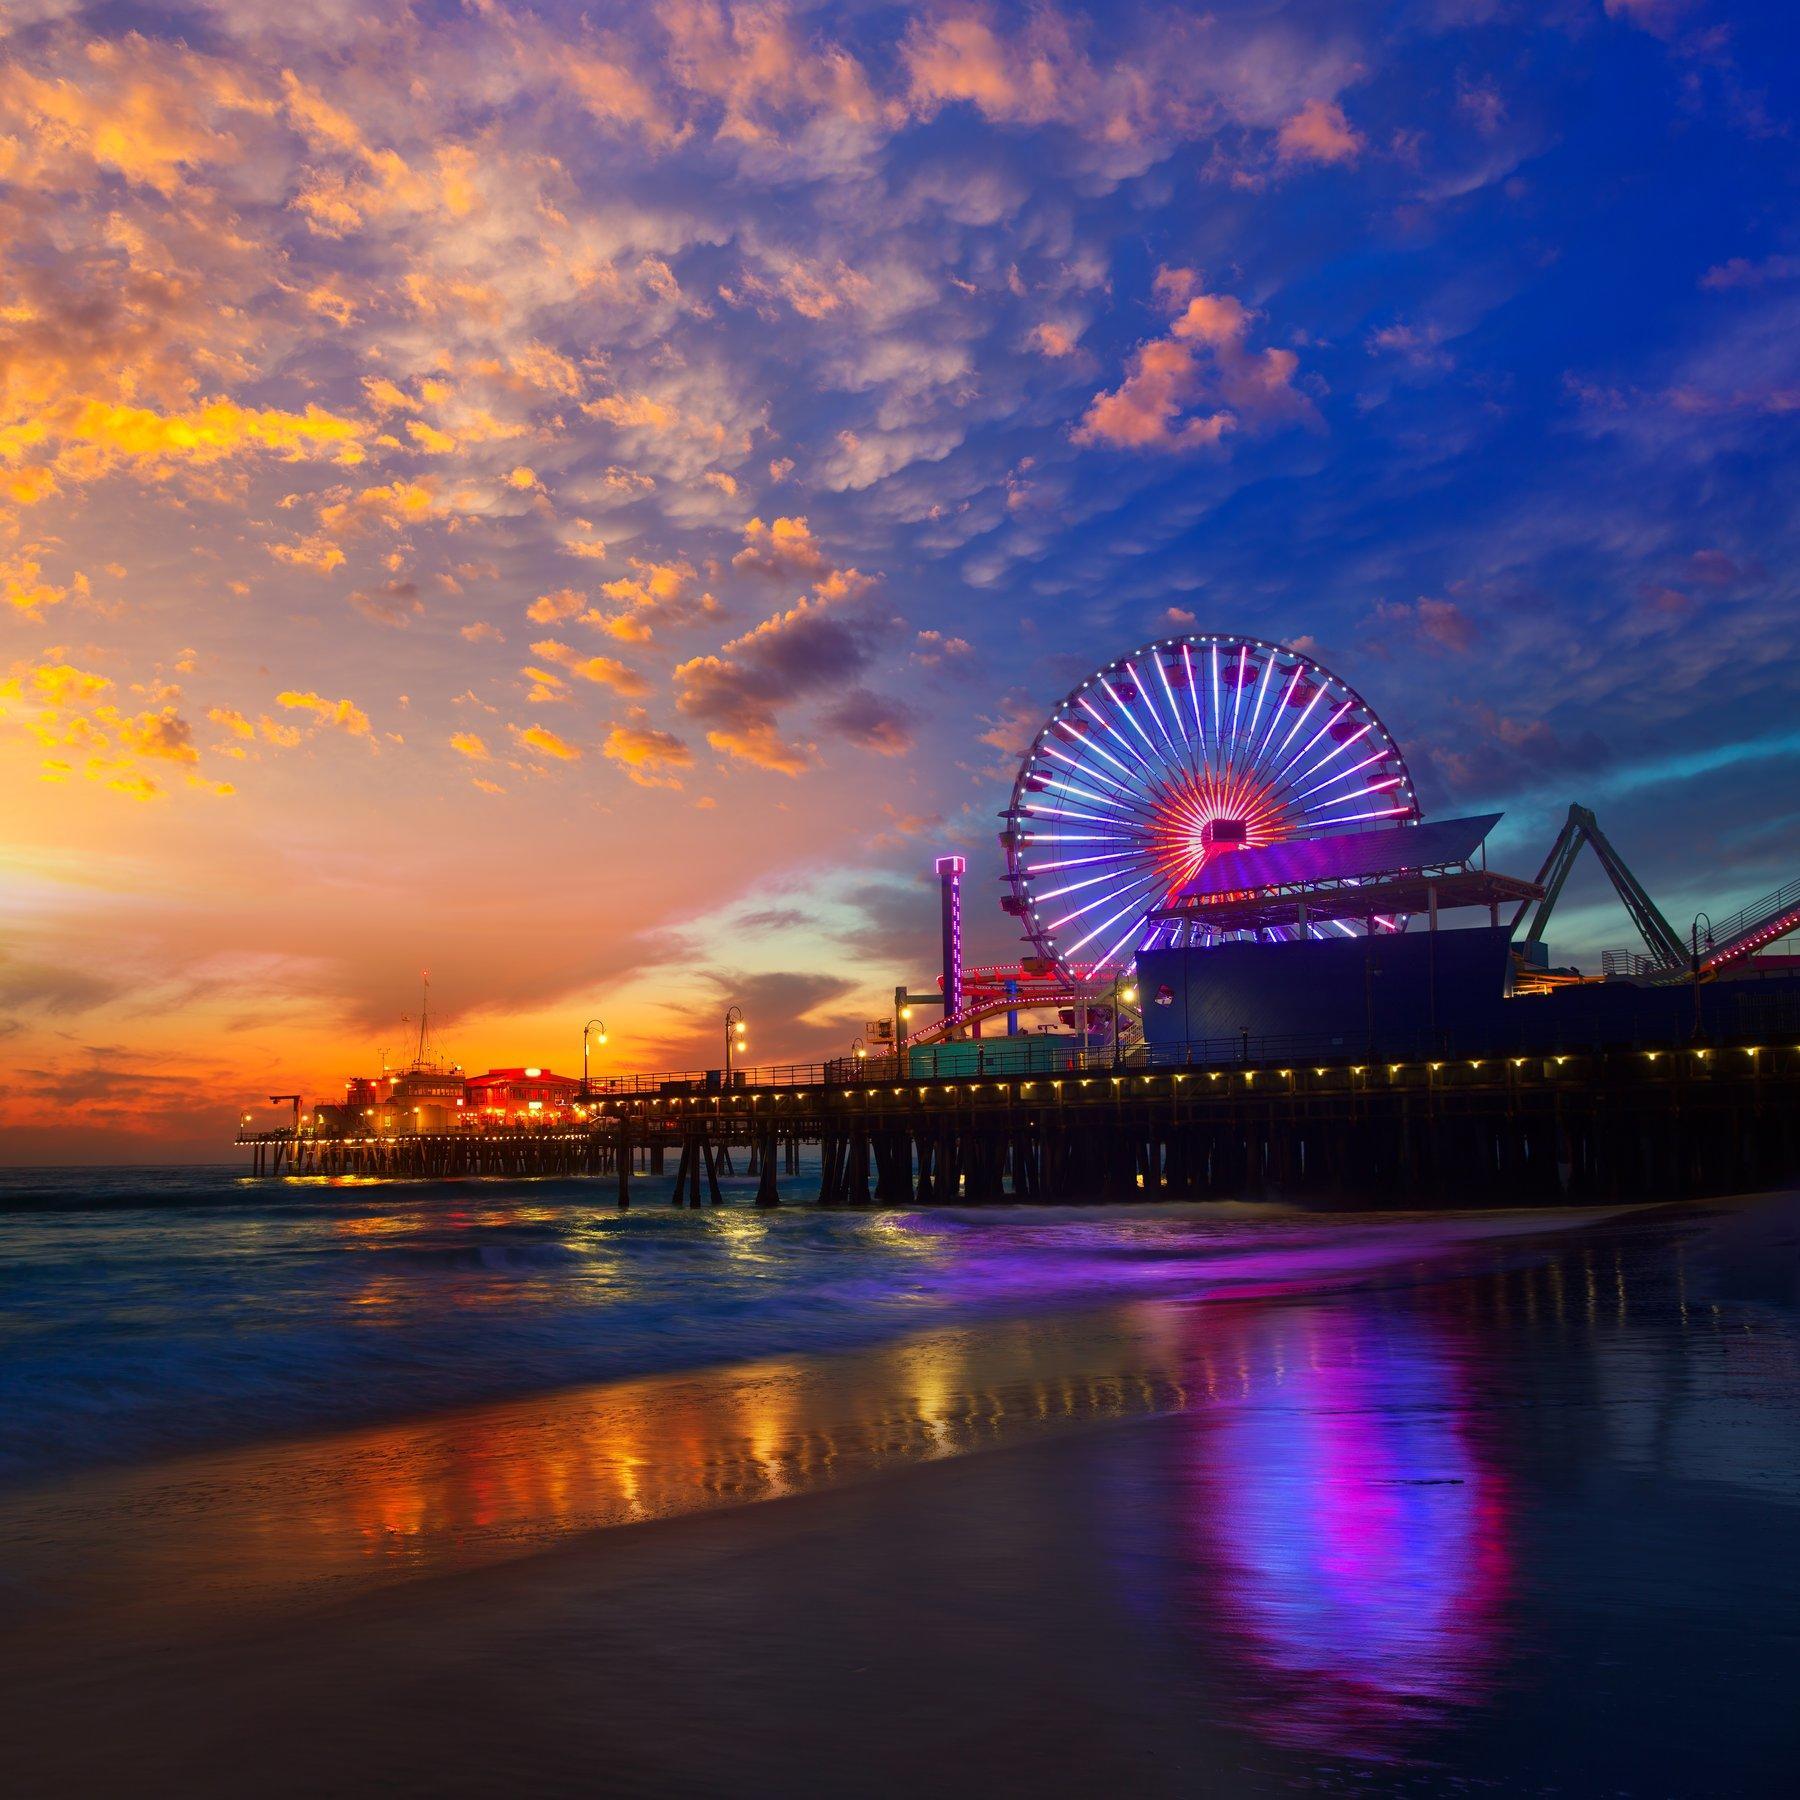 Santa Monica Pier lit up at sunset